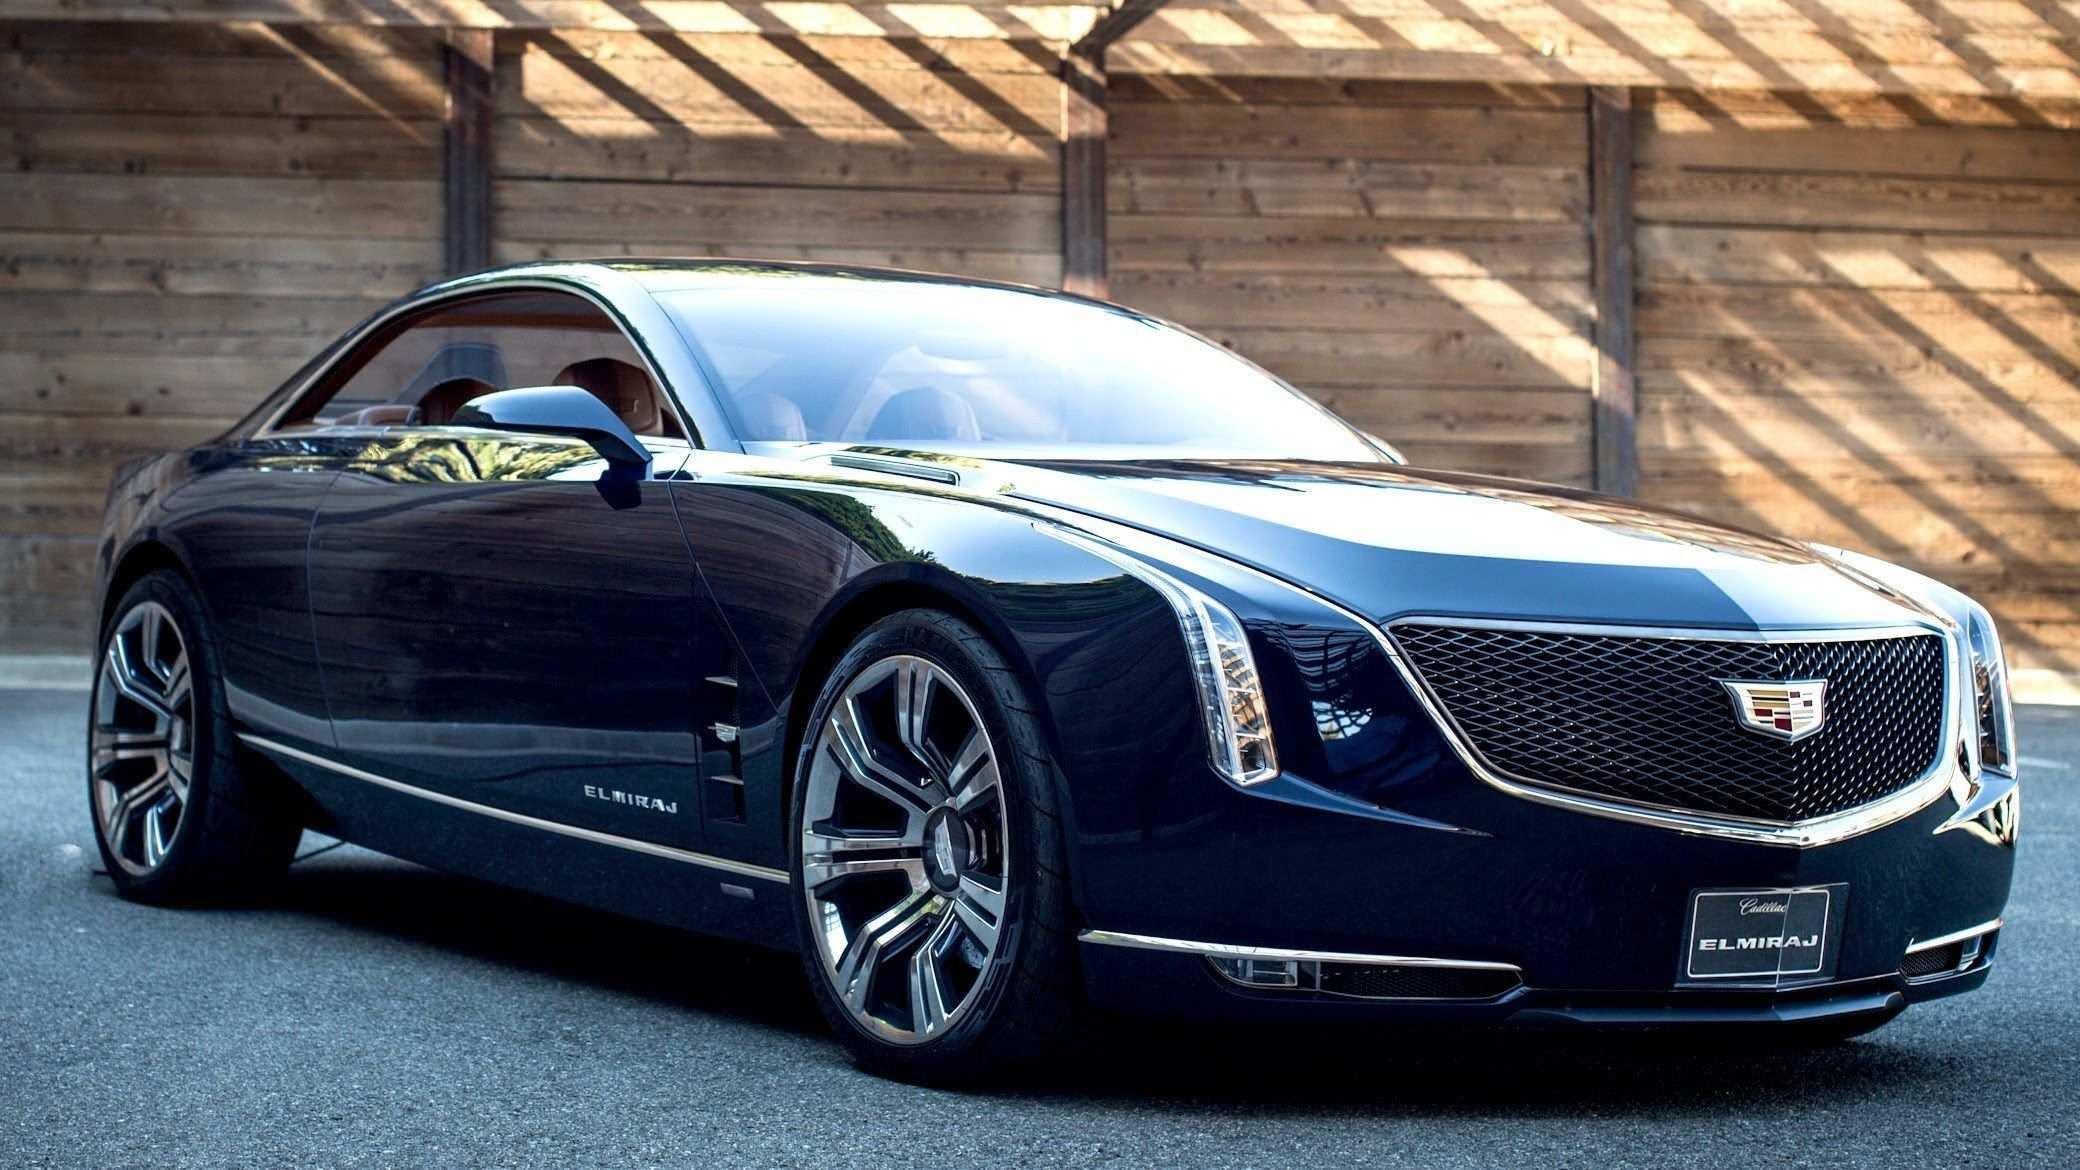 47 Great 2020 Cadillac Elmiraj Pricing for 2020 Cadillac Elmiraj